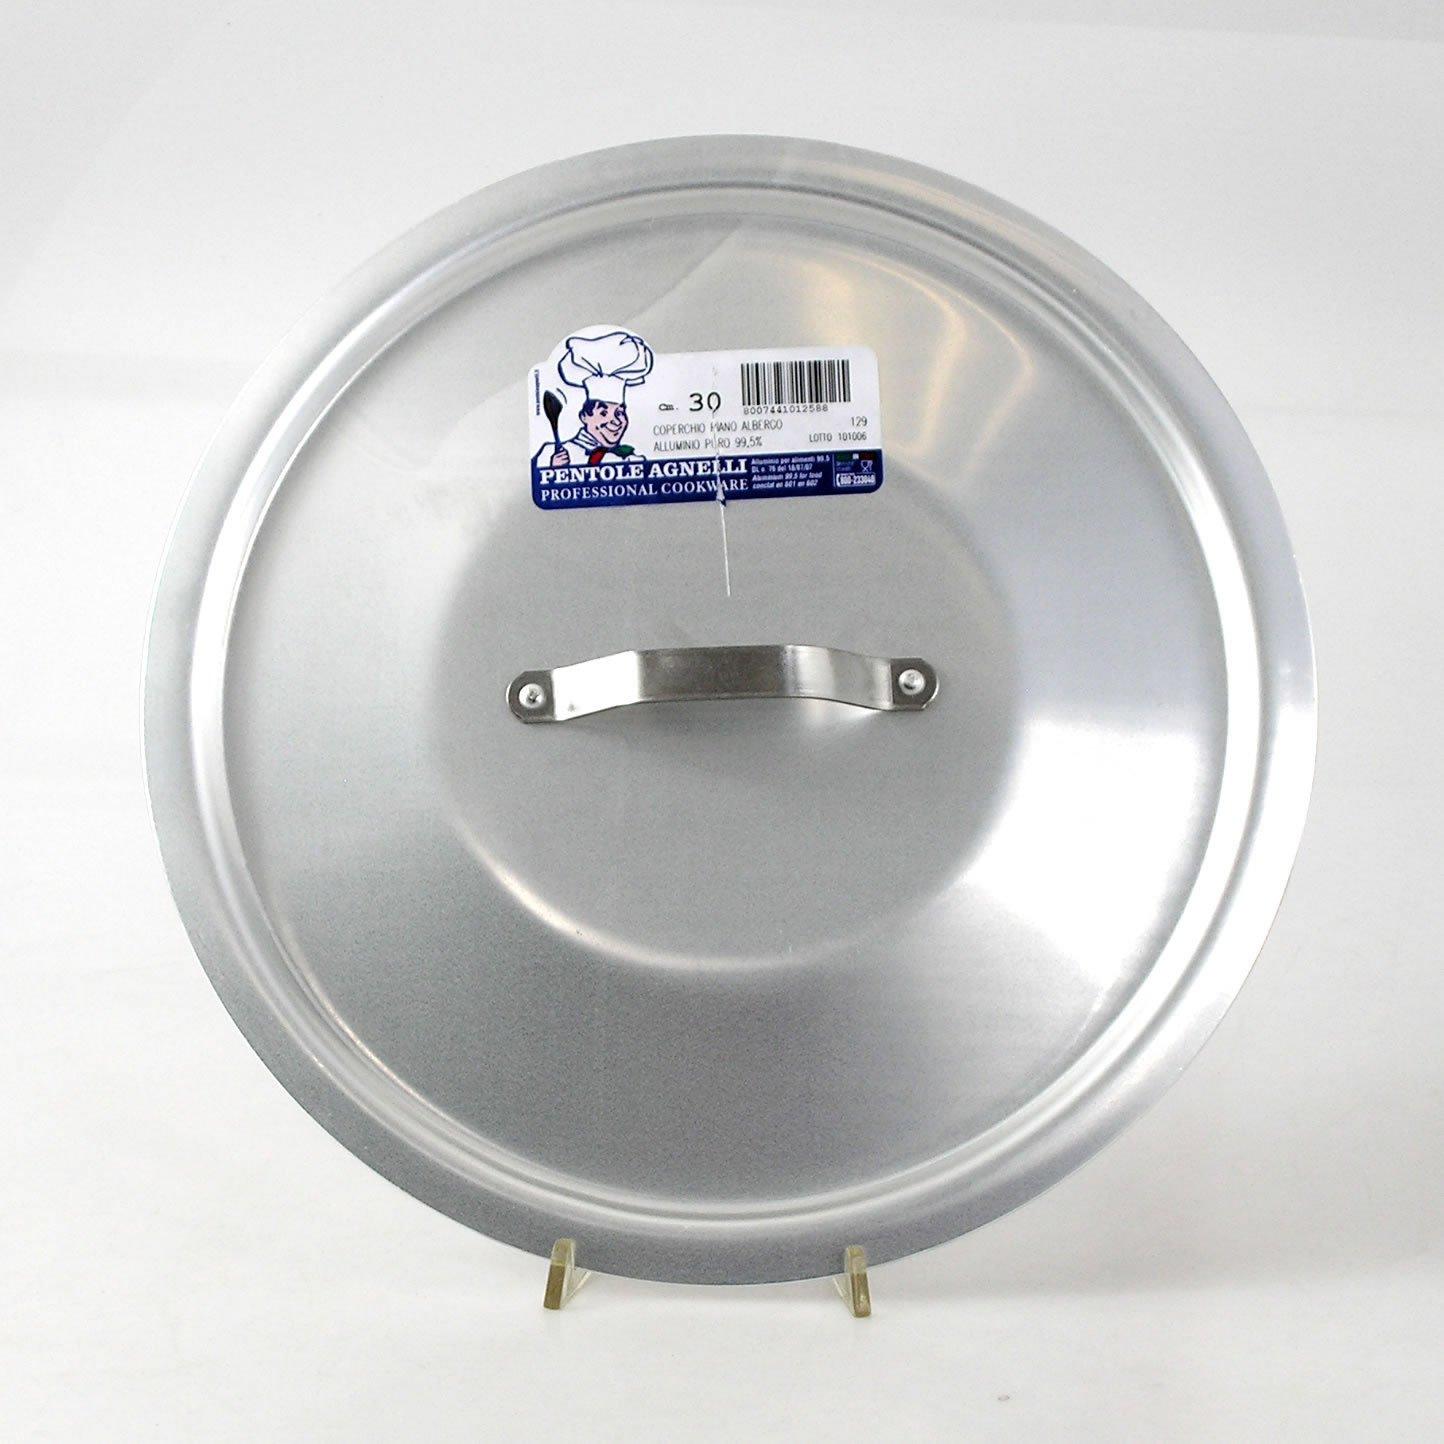 Pentole Agnelli ALMA12920 Aluminio - Tapa (Aluminio, Aluminio, Acero inoxidable, 20 cm): Amazon.es: Hogar